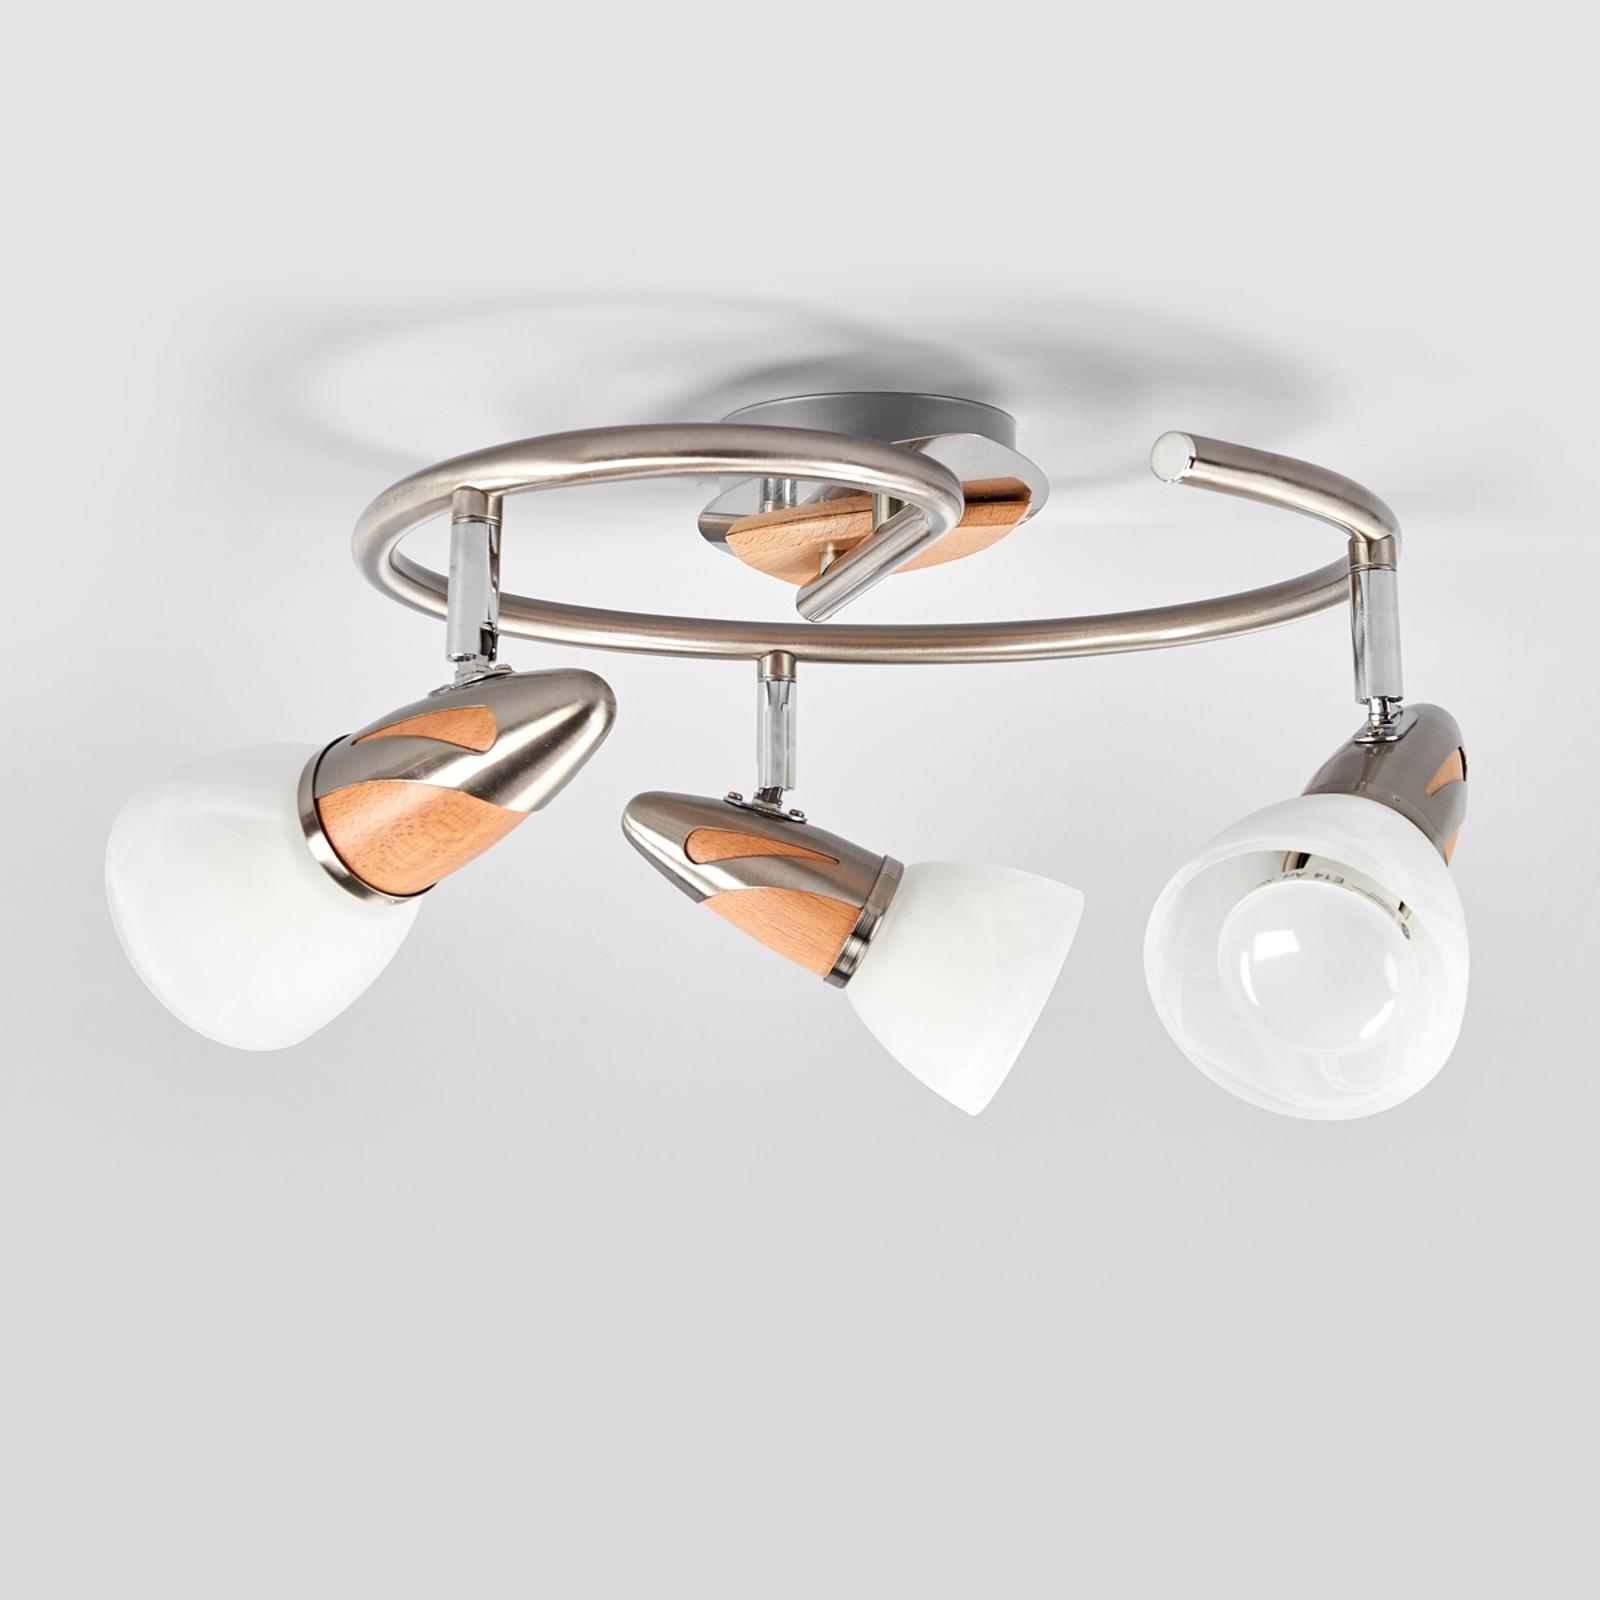 Marena taklampe med 3 LED lys | Lampegiganten.no